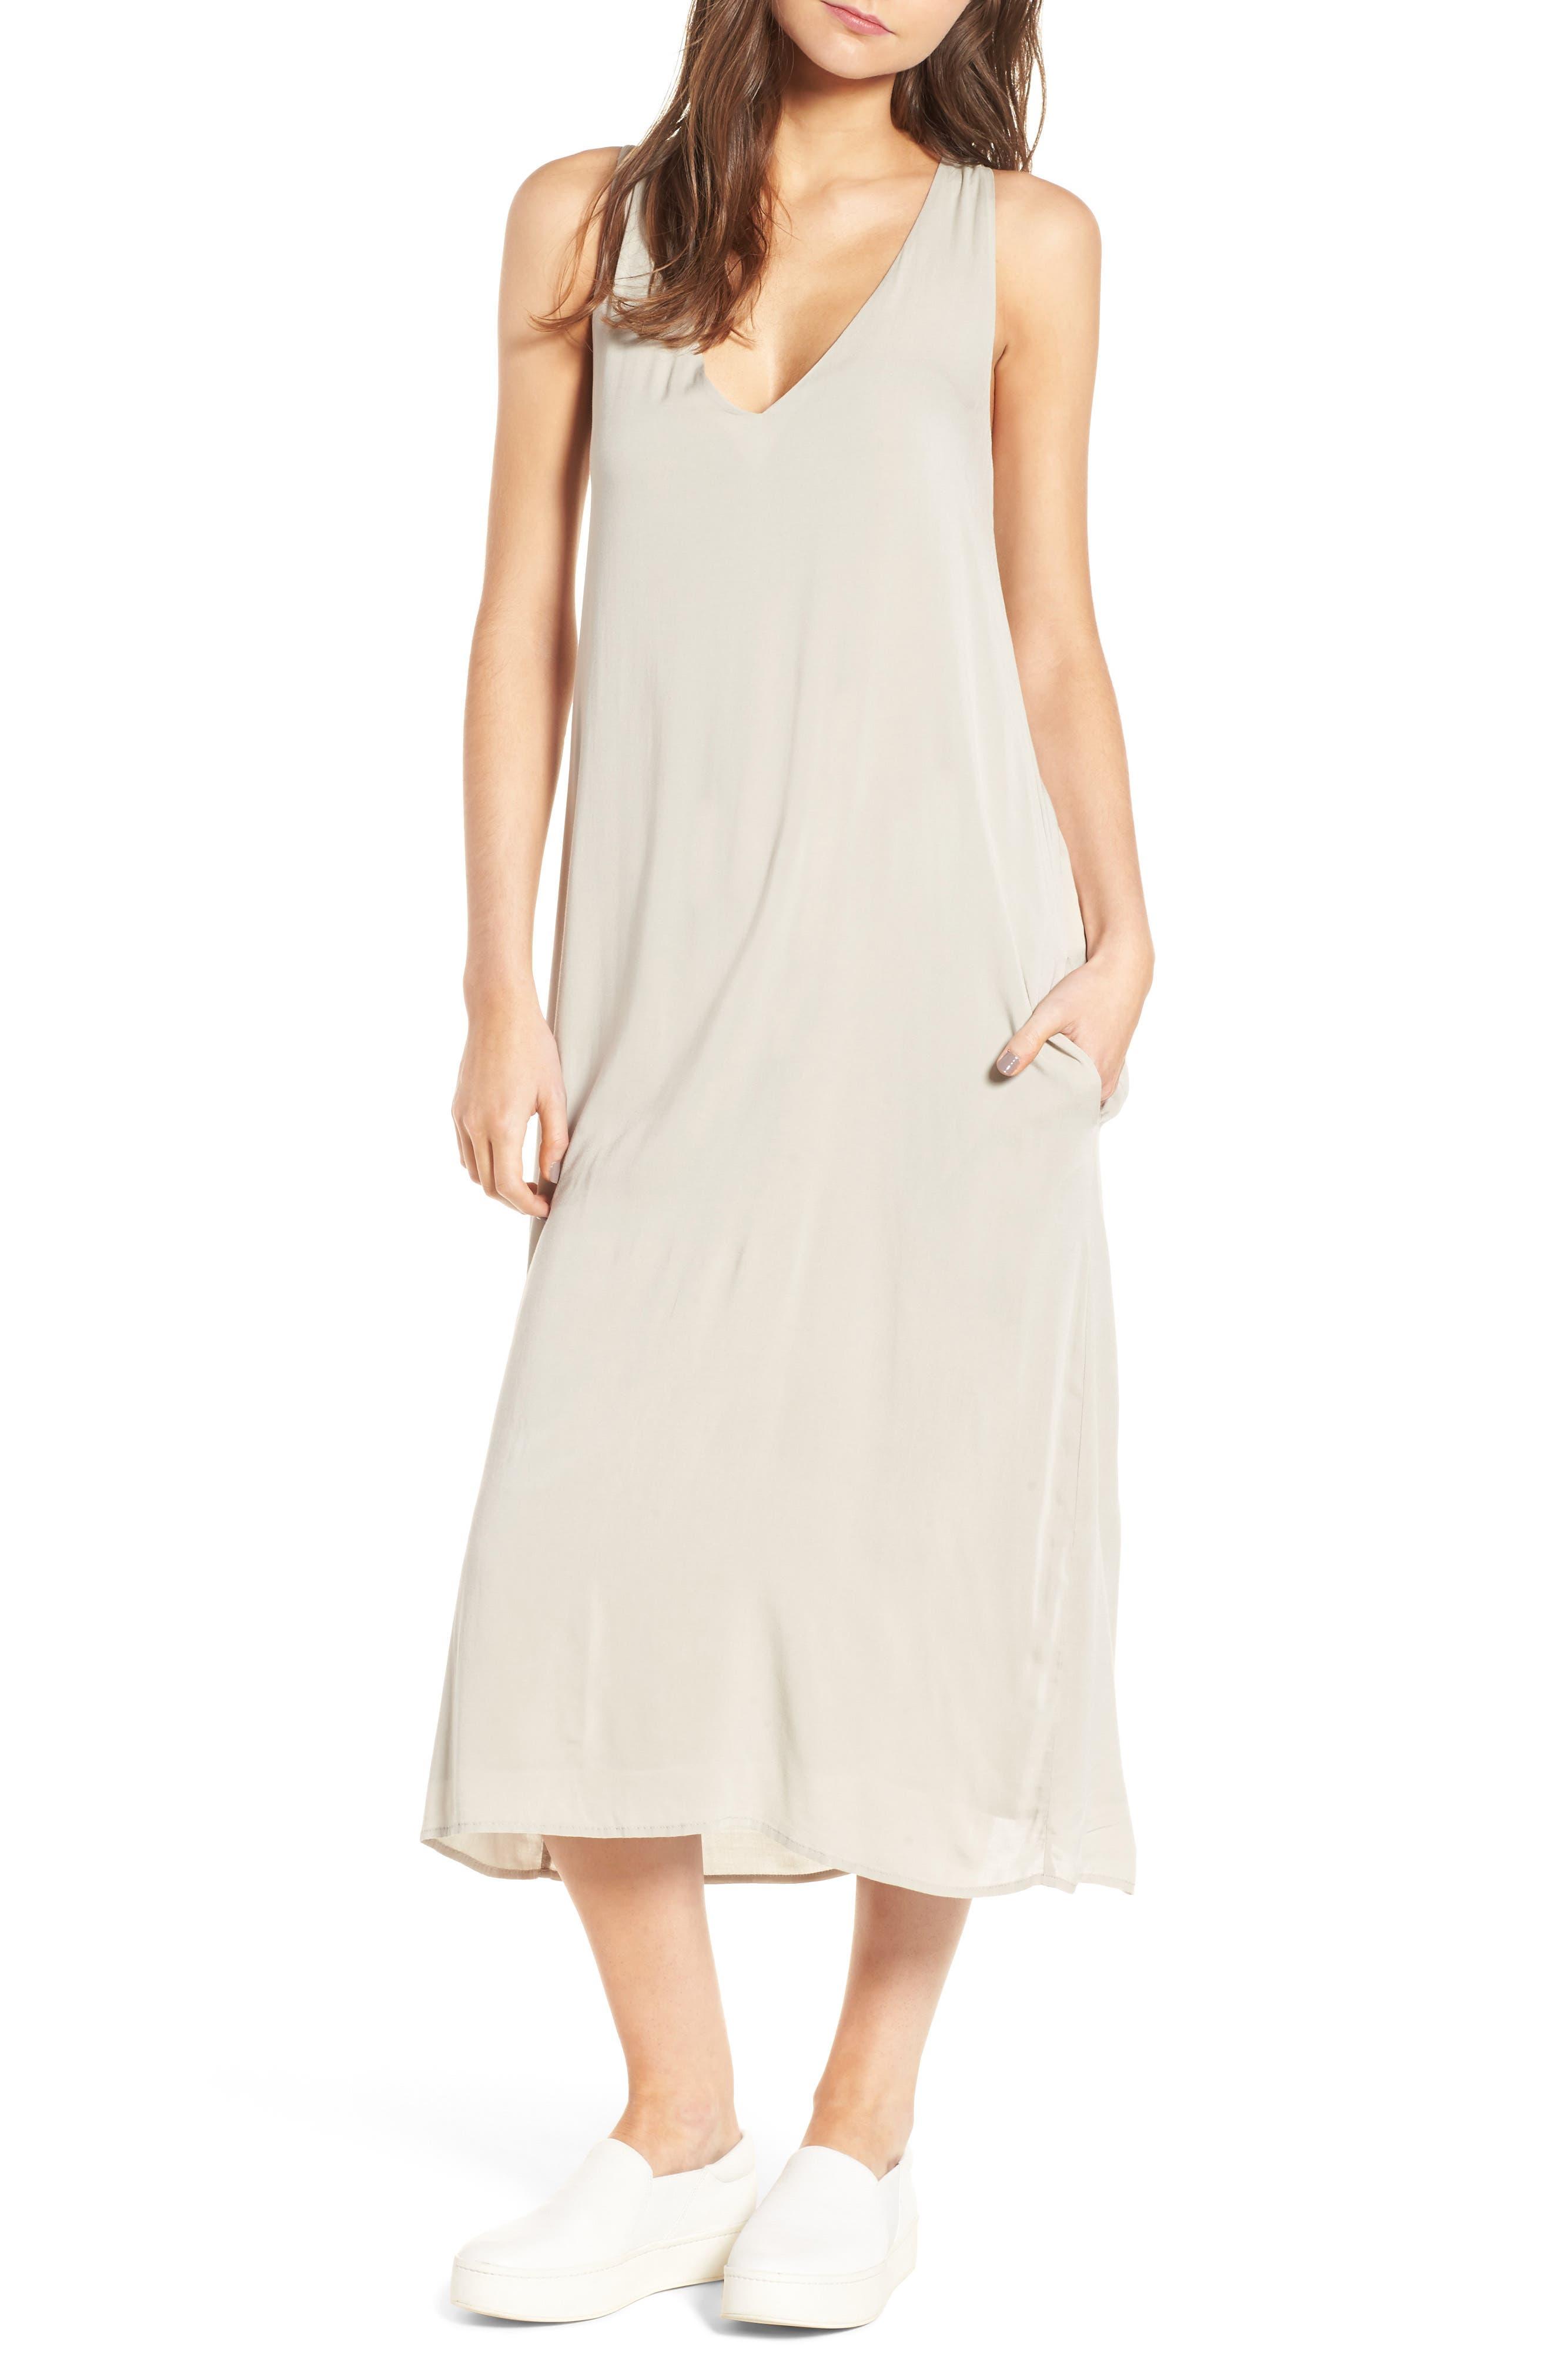 James Perse Twist Back Dress